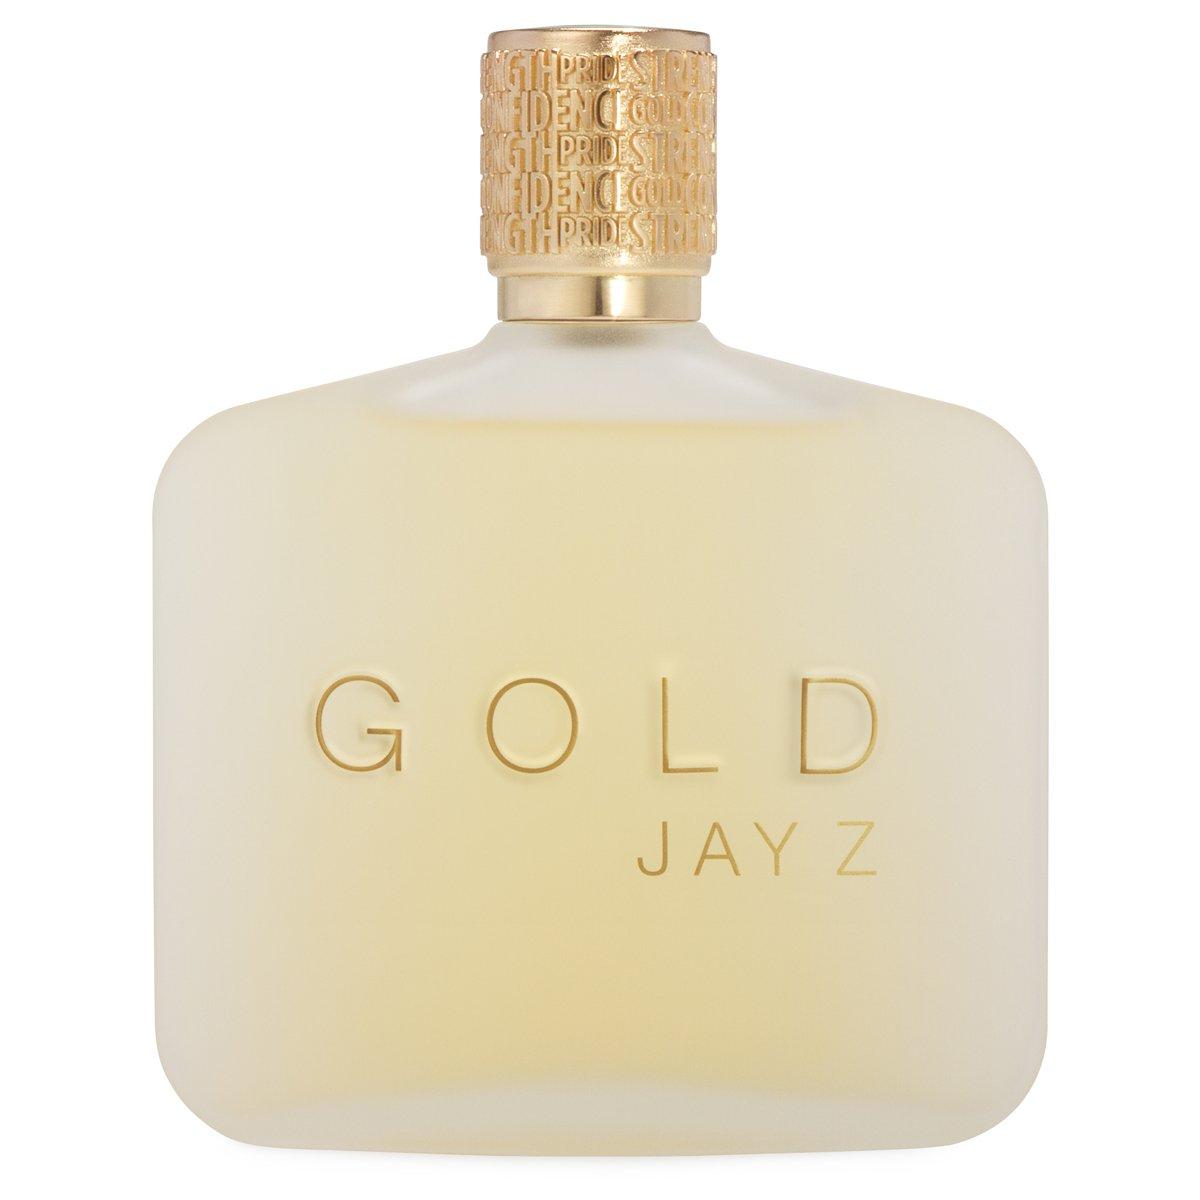 Jay Z Gold After Shave, 3 Oz 0608940554265